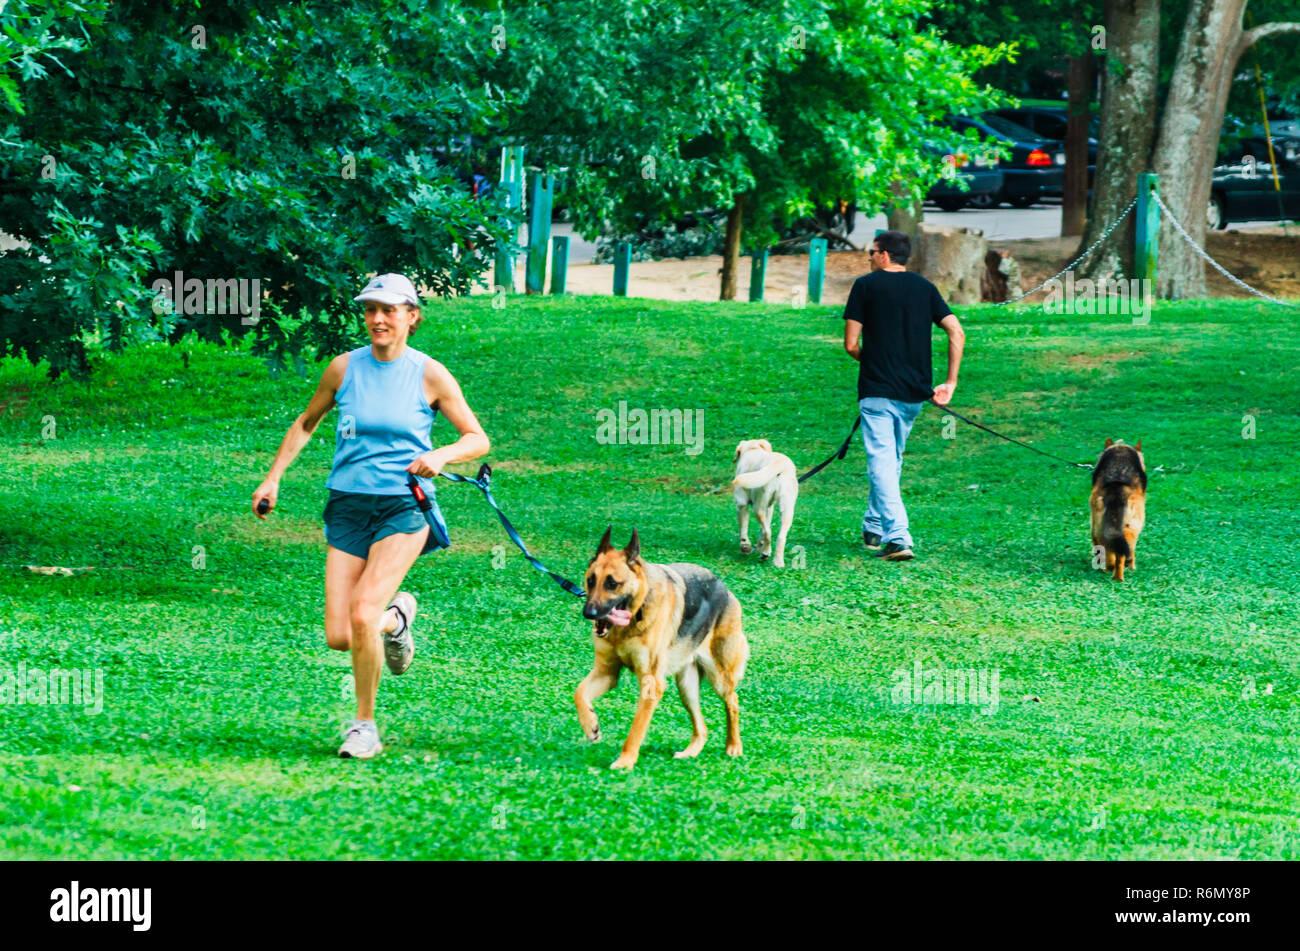 Pet owners walk their dogs at Candler Park, June 4, 2014, in Atlanta, Georgia. - Stock Image